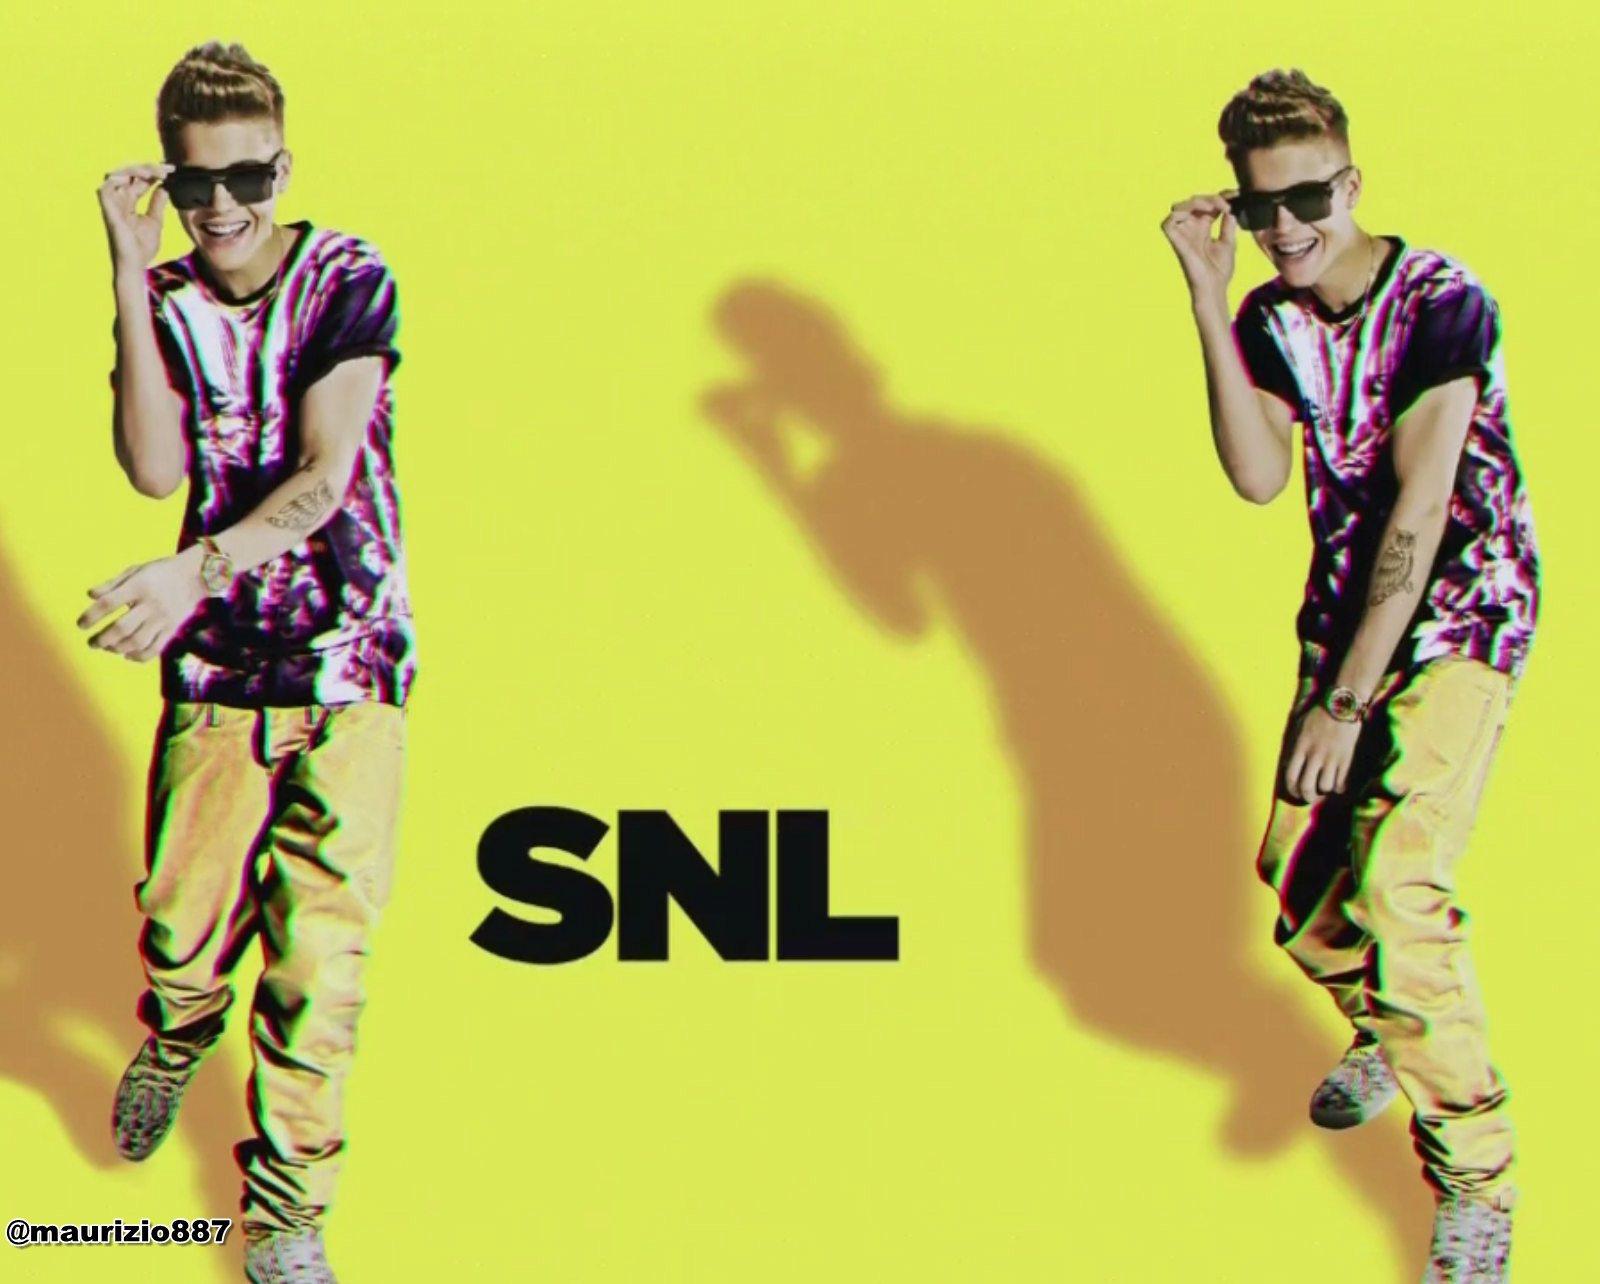 justin bieber SNL, 2013 - Justin Bieber Photo (33582834) - Fanpop